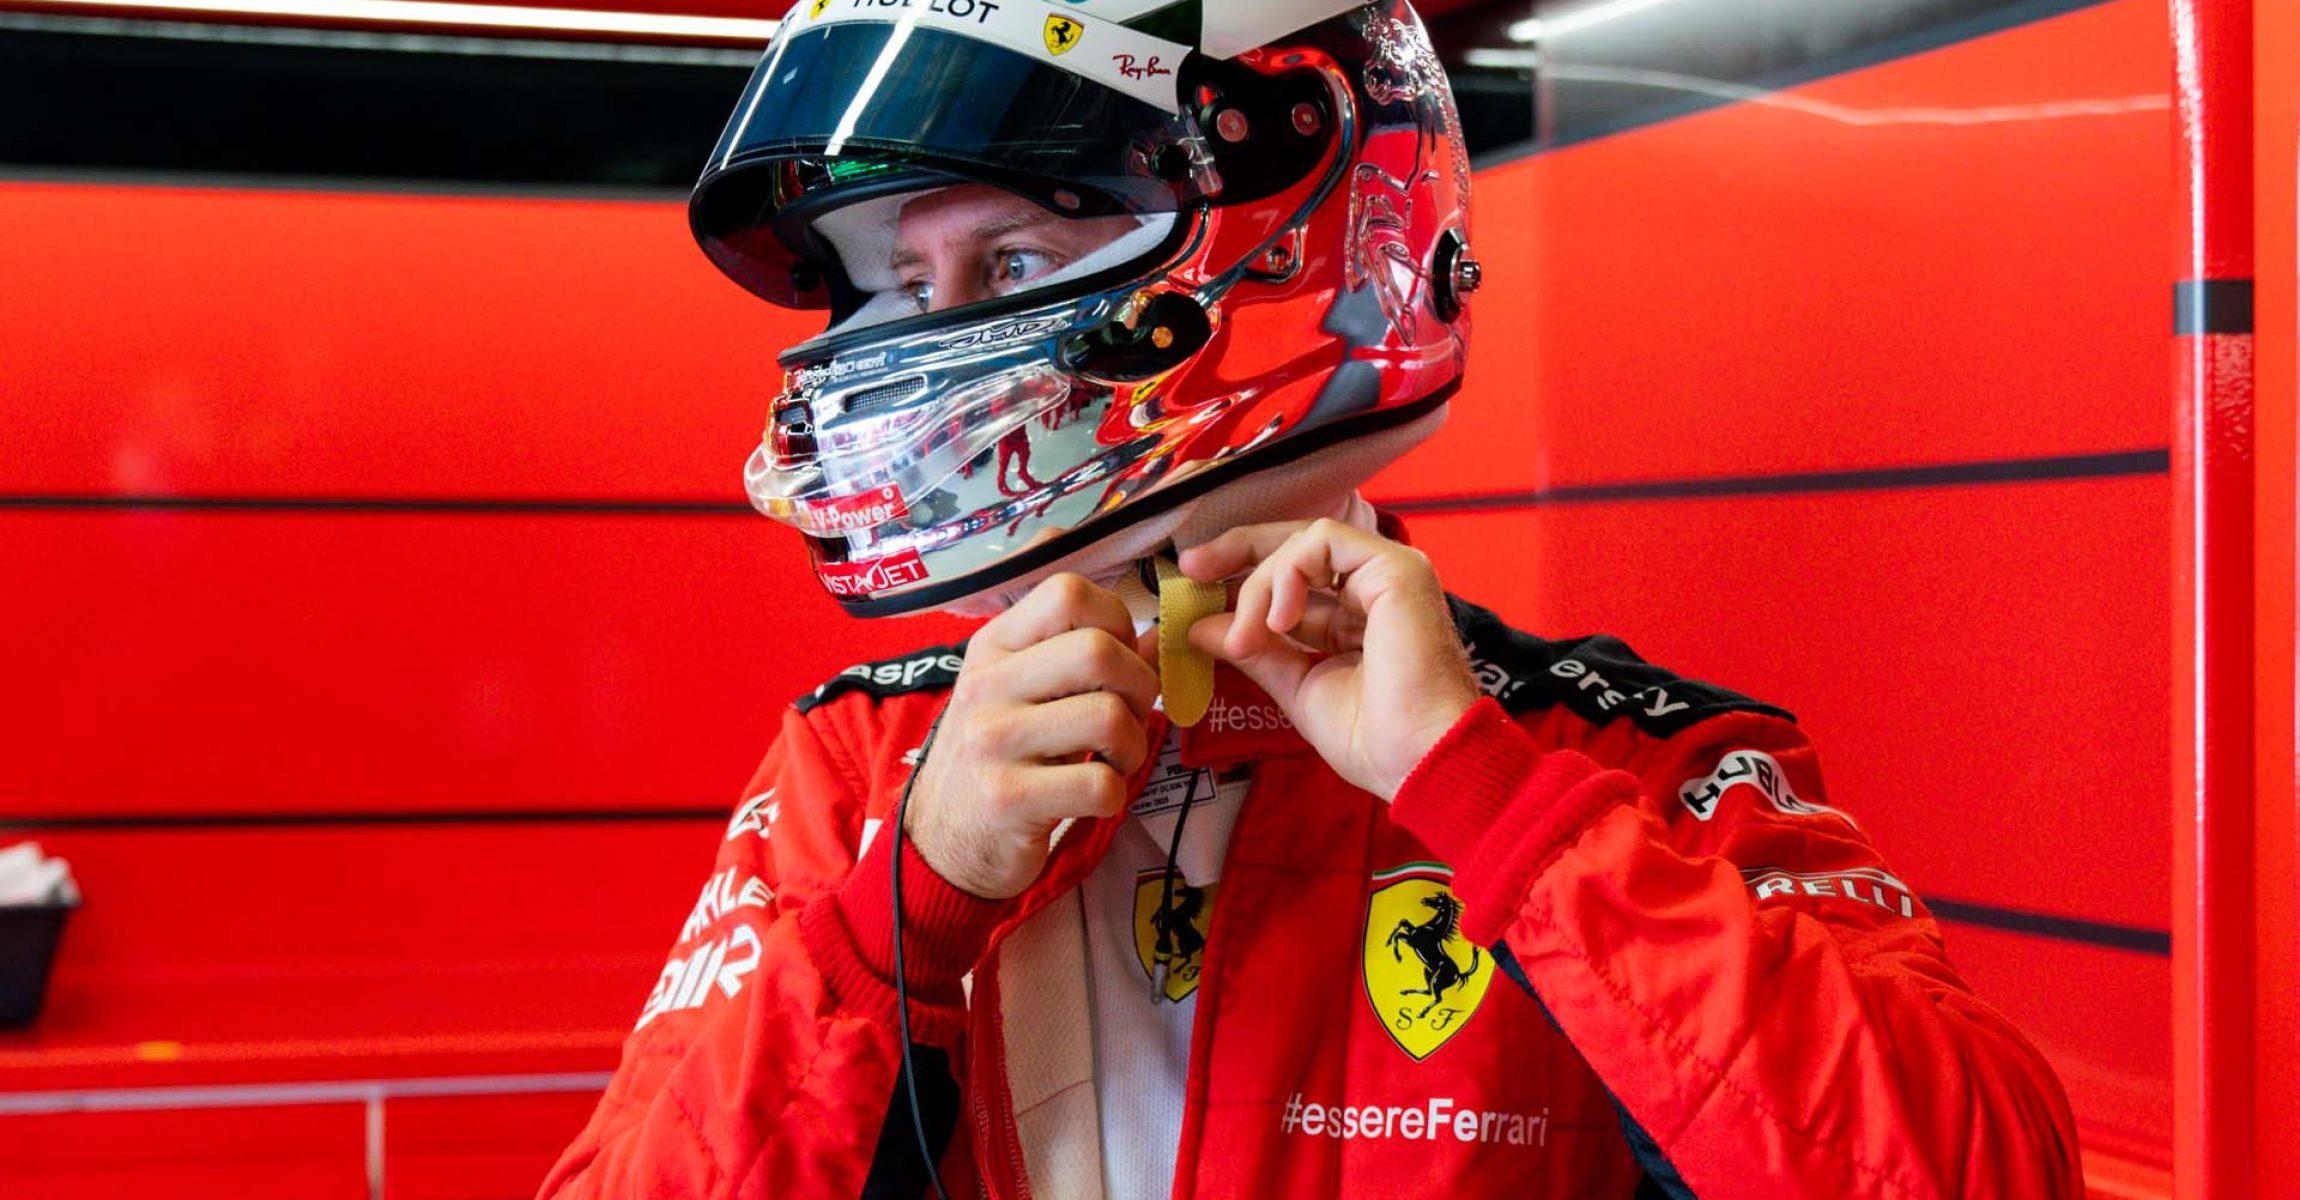 GP ITALIA F1/2020 -  VENERDÌ 04/09/2020       credit: @Scuderia Ferrari Press Office Sebastian Vettel